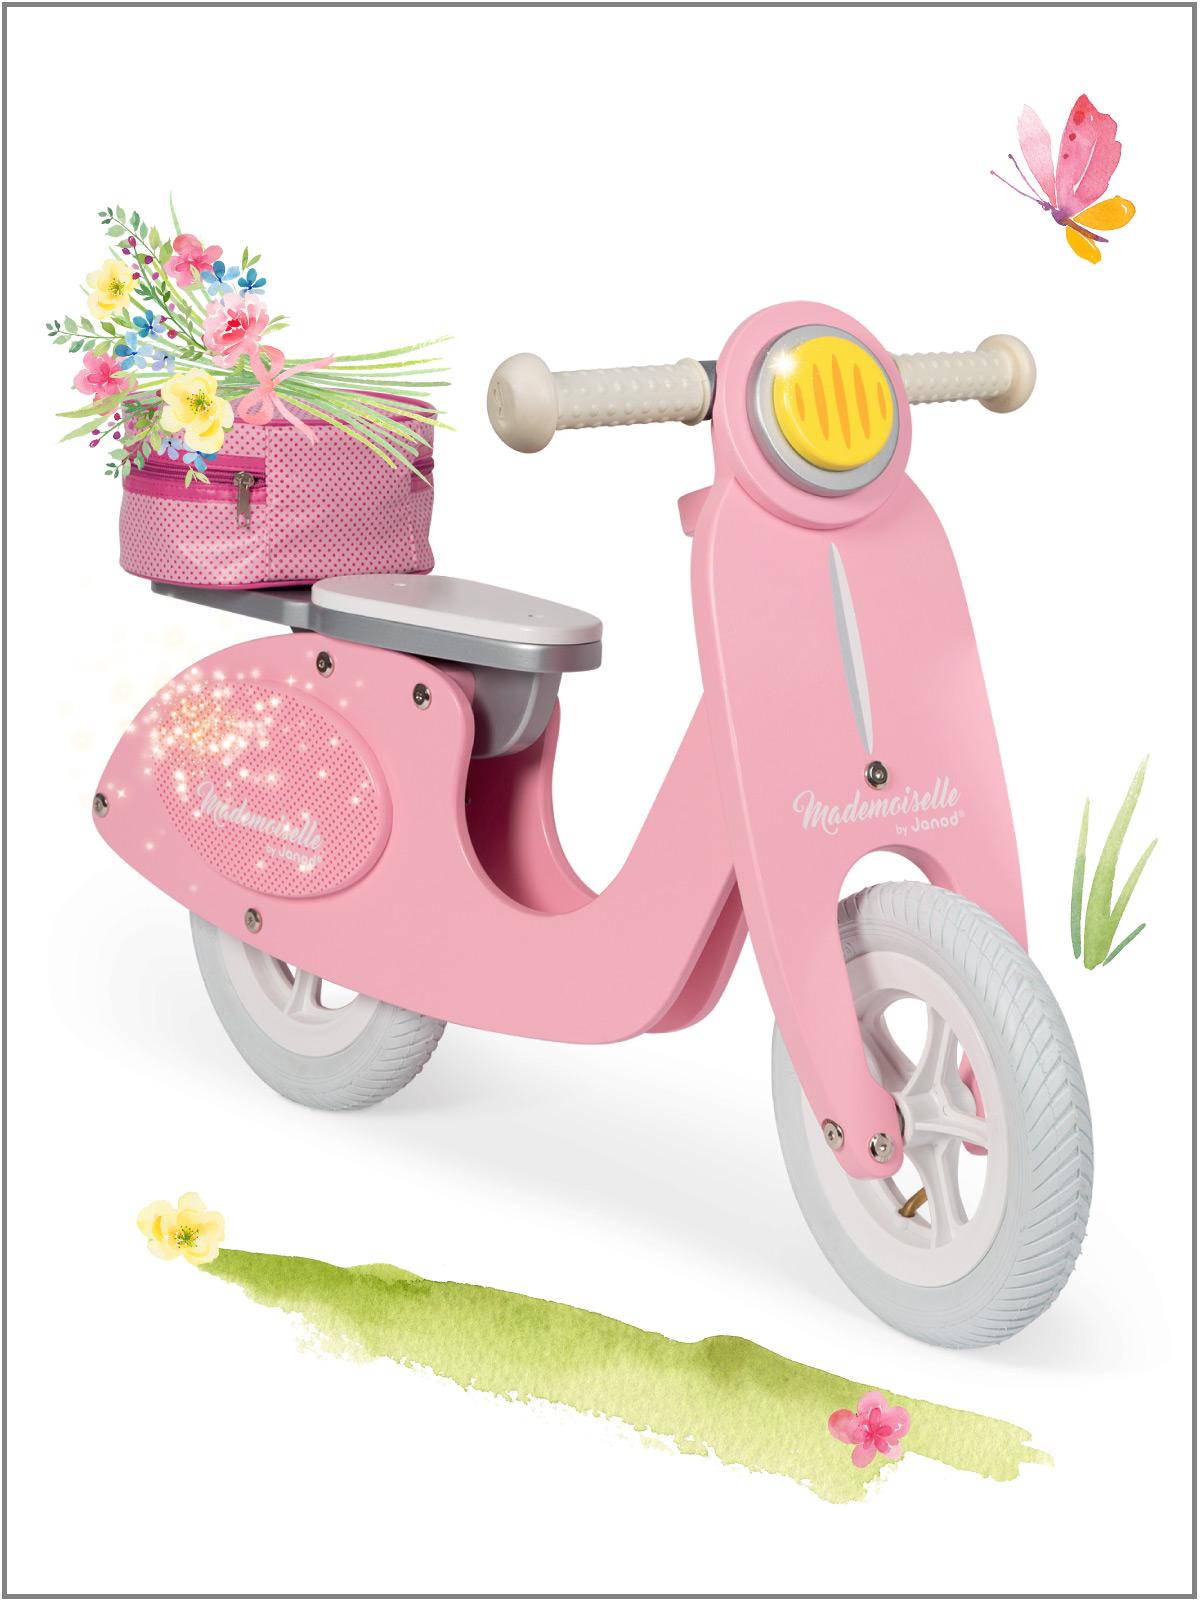 frederickandsophie-kids-toys-janod-france-scooter-pink-outdoor